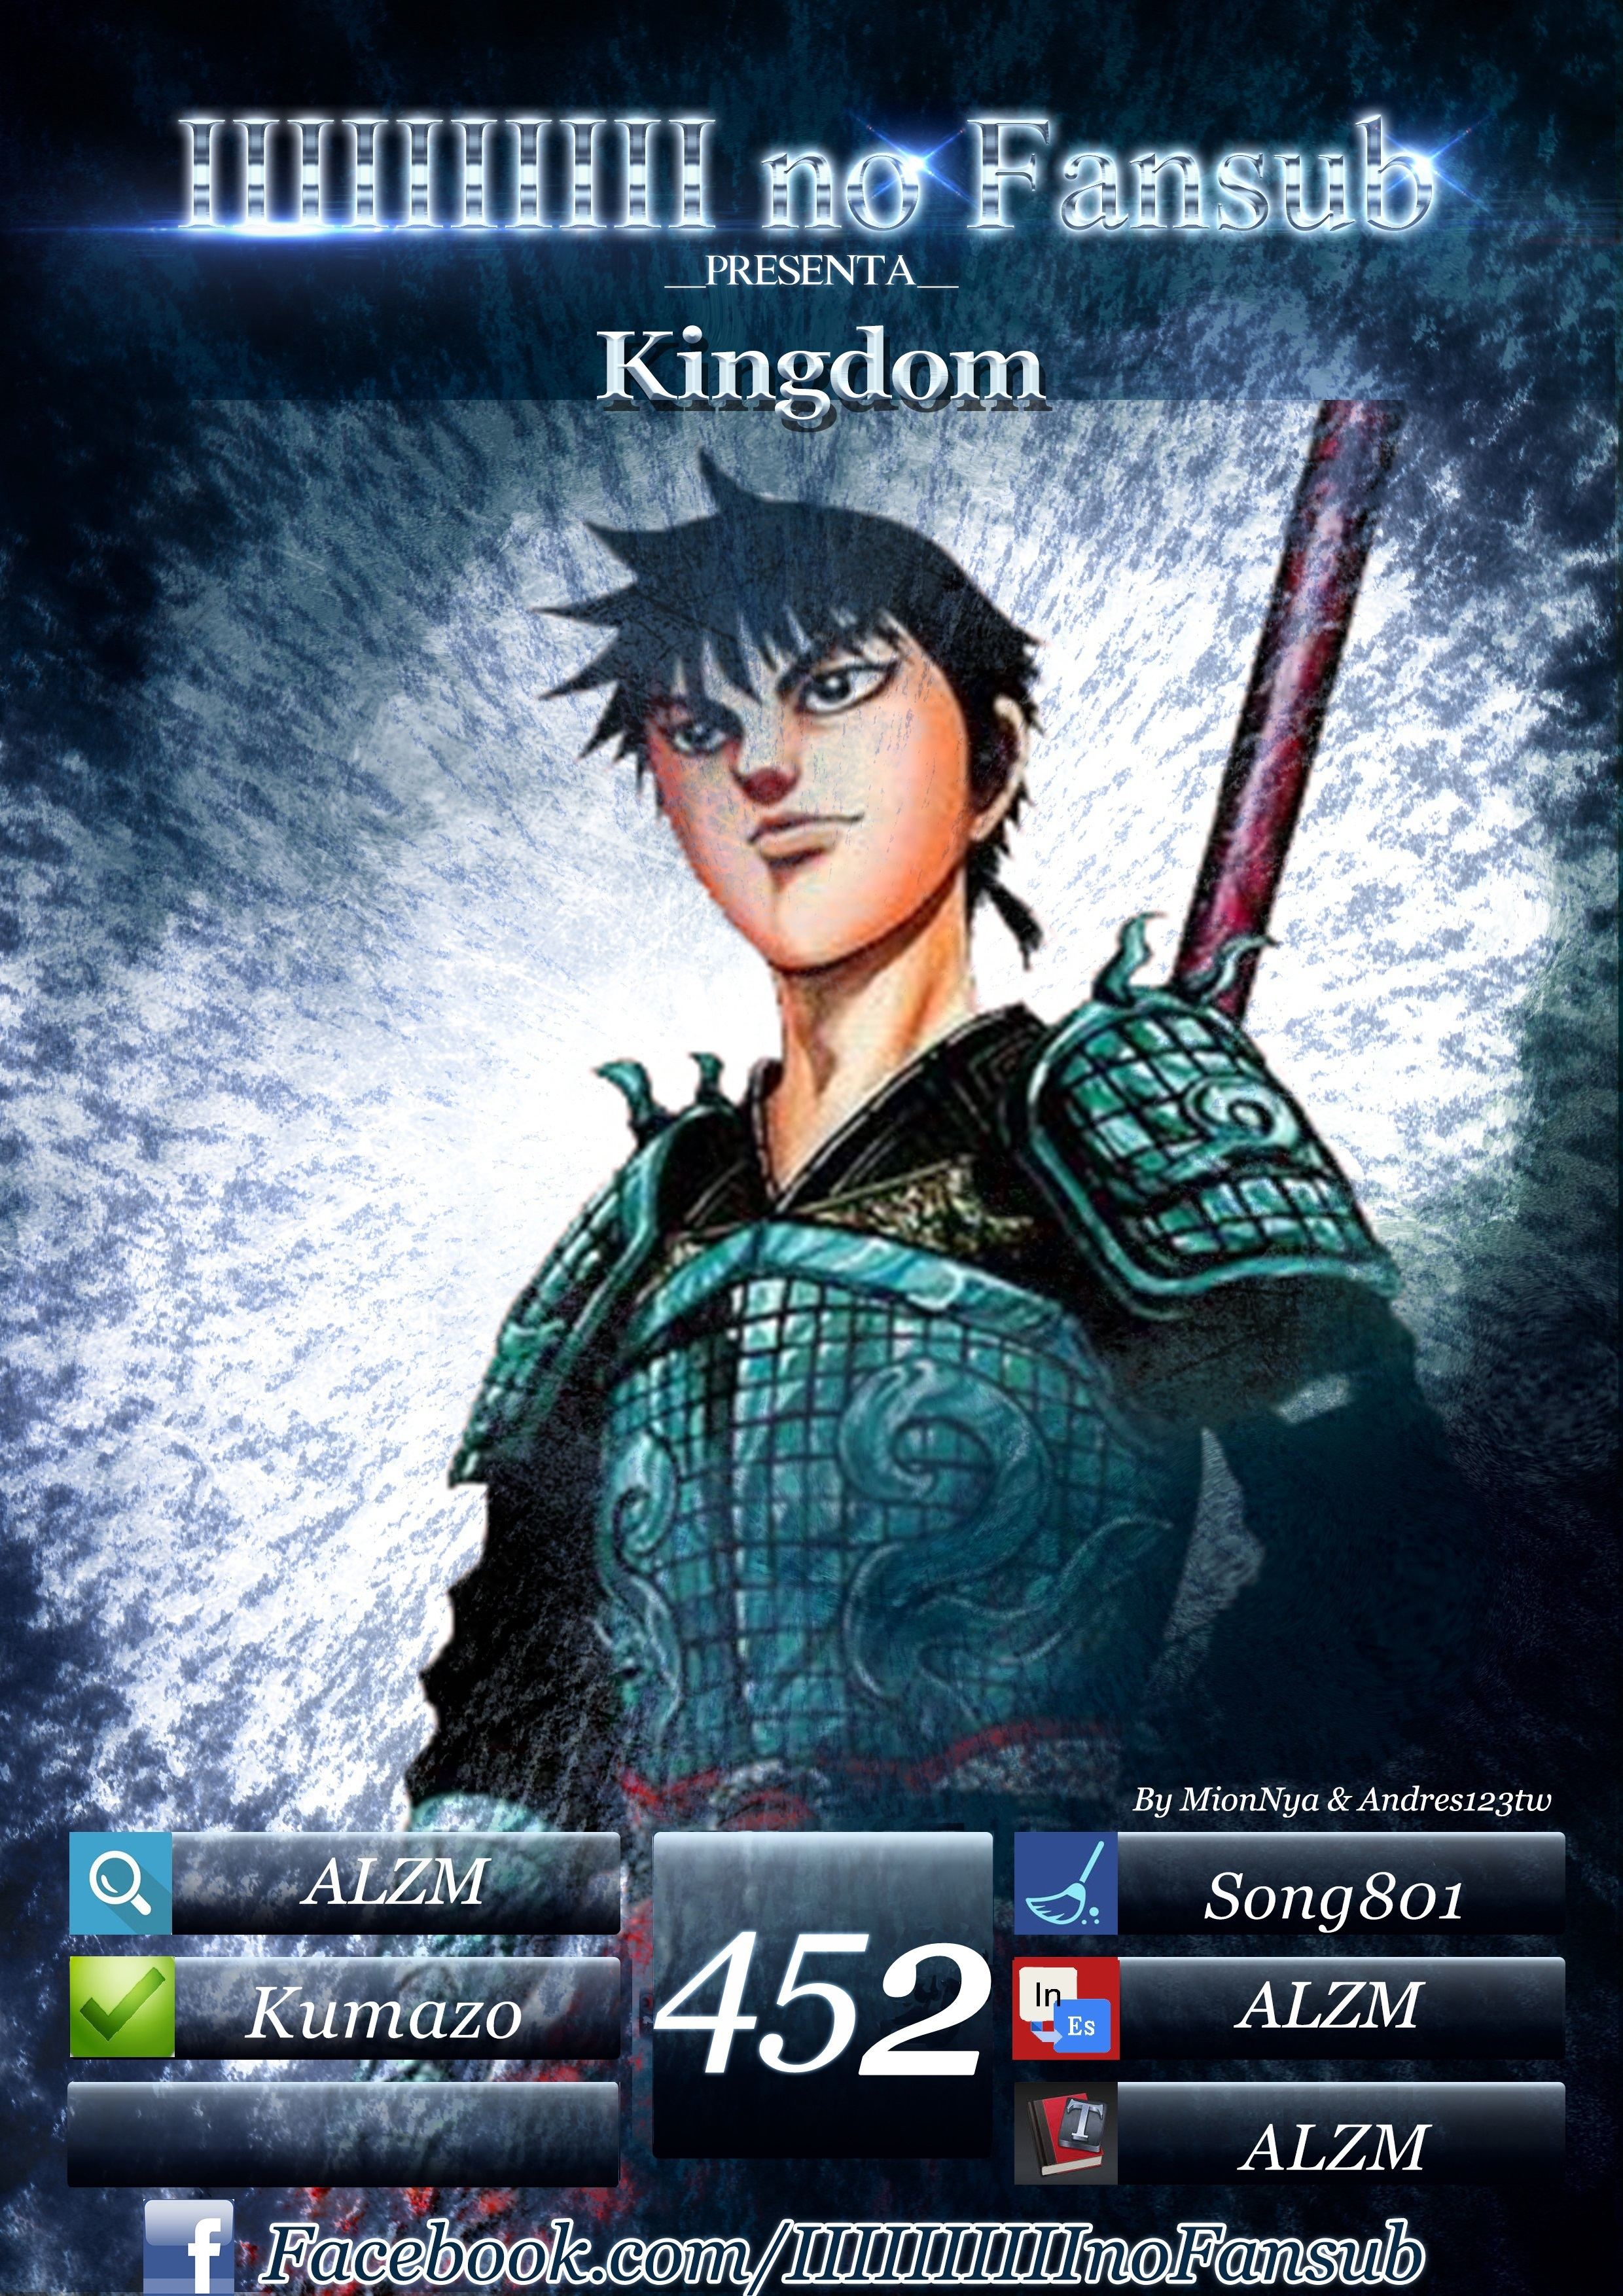 https://c5.ninemanga.com/es_manga/19/12307/429520/5f3c24304aafba0152abbc39fe39aebe.jpg Page 1